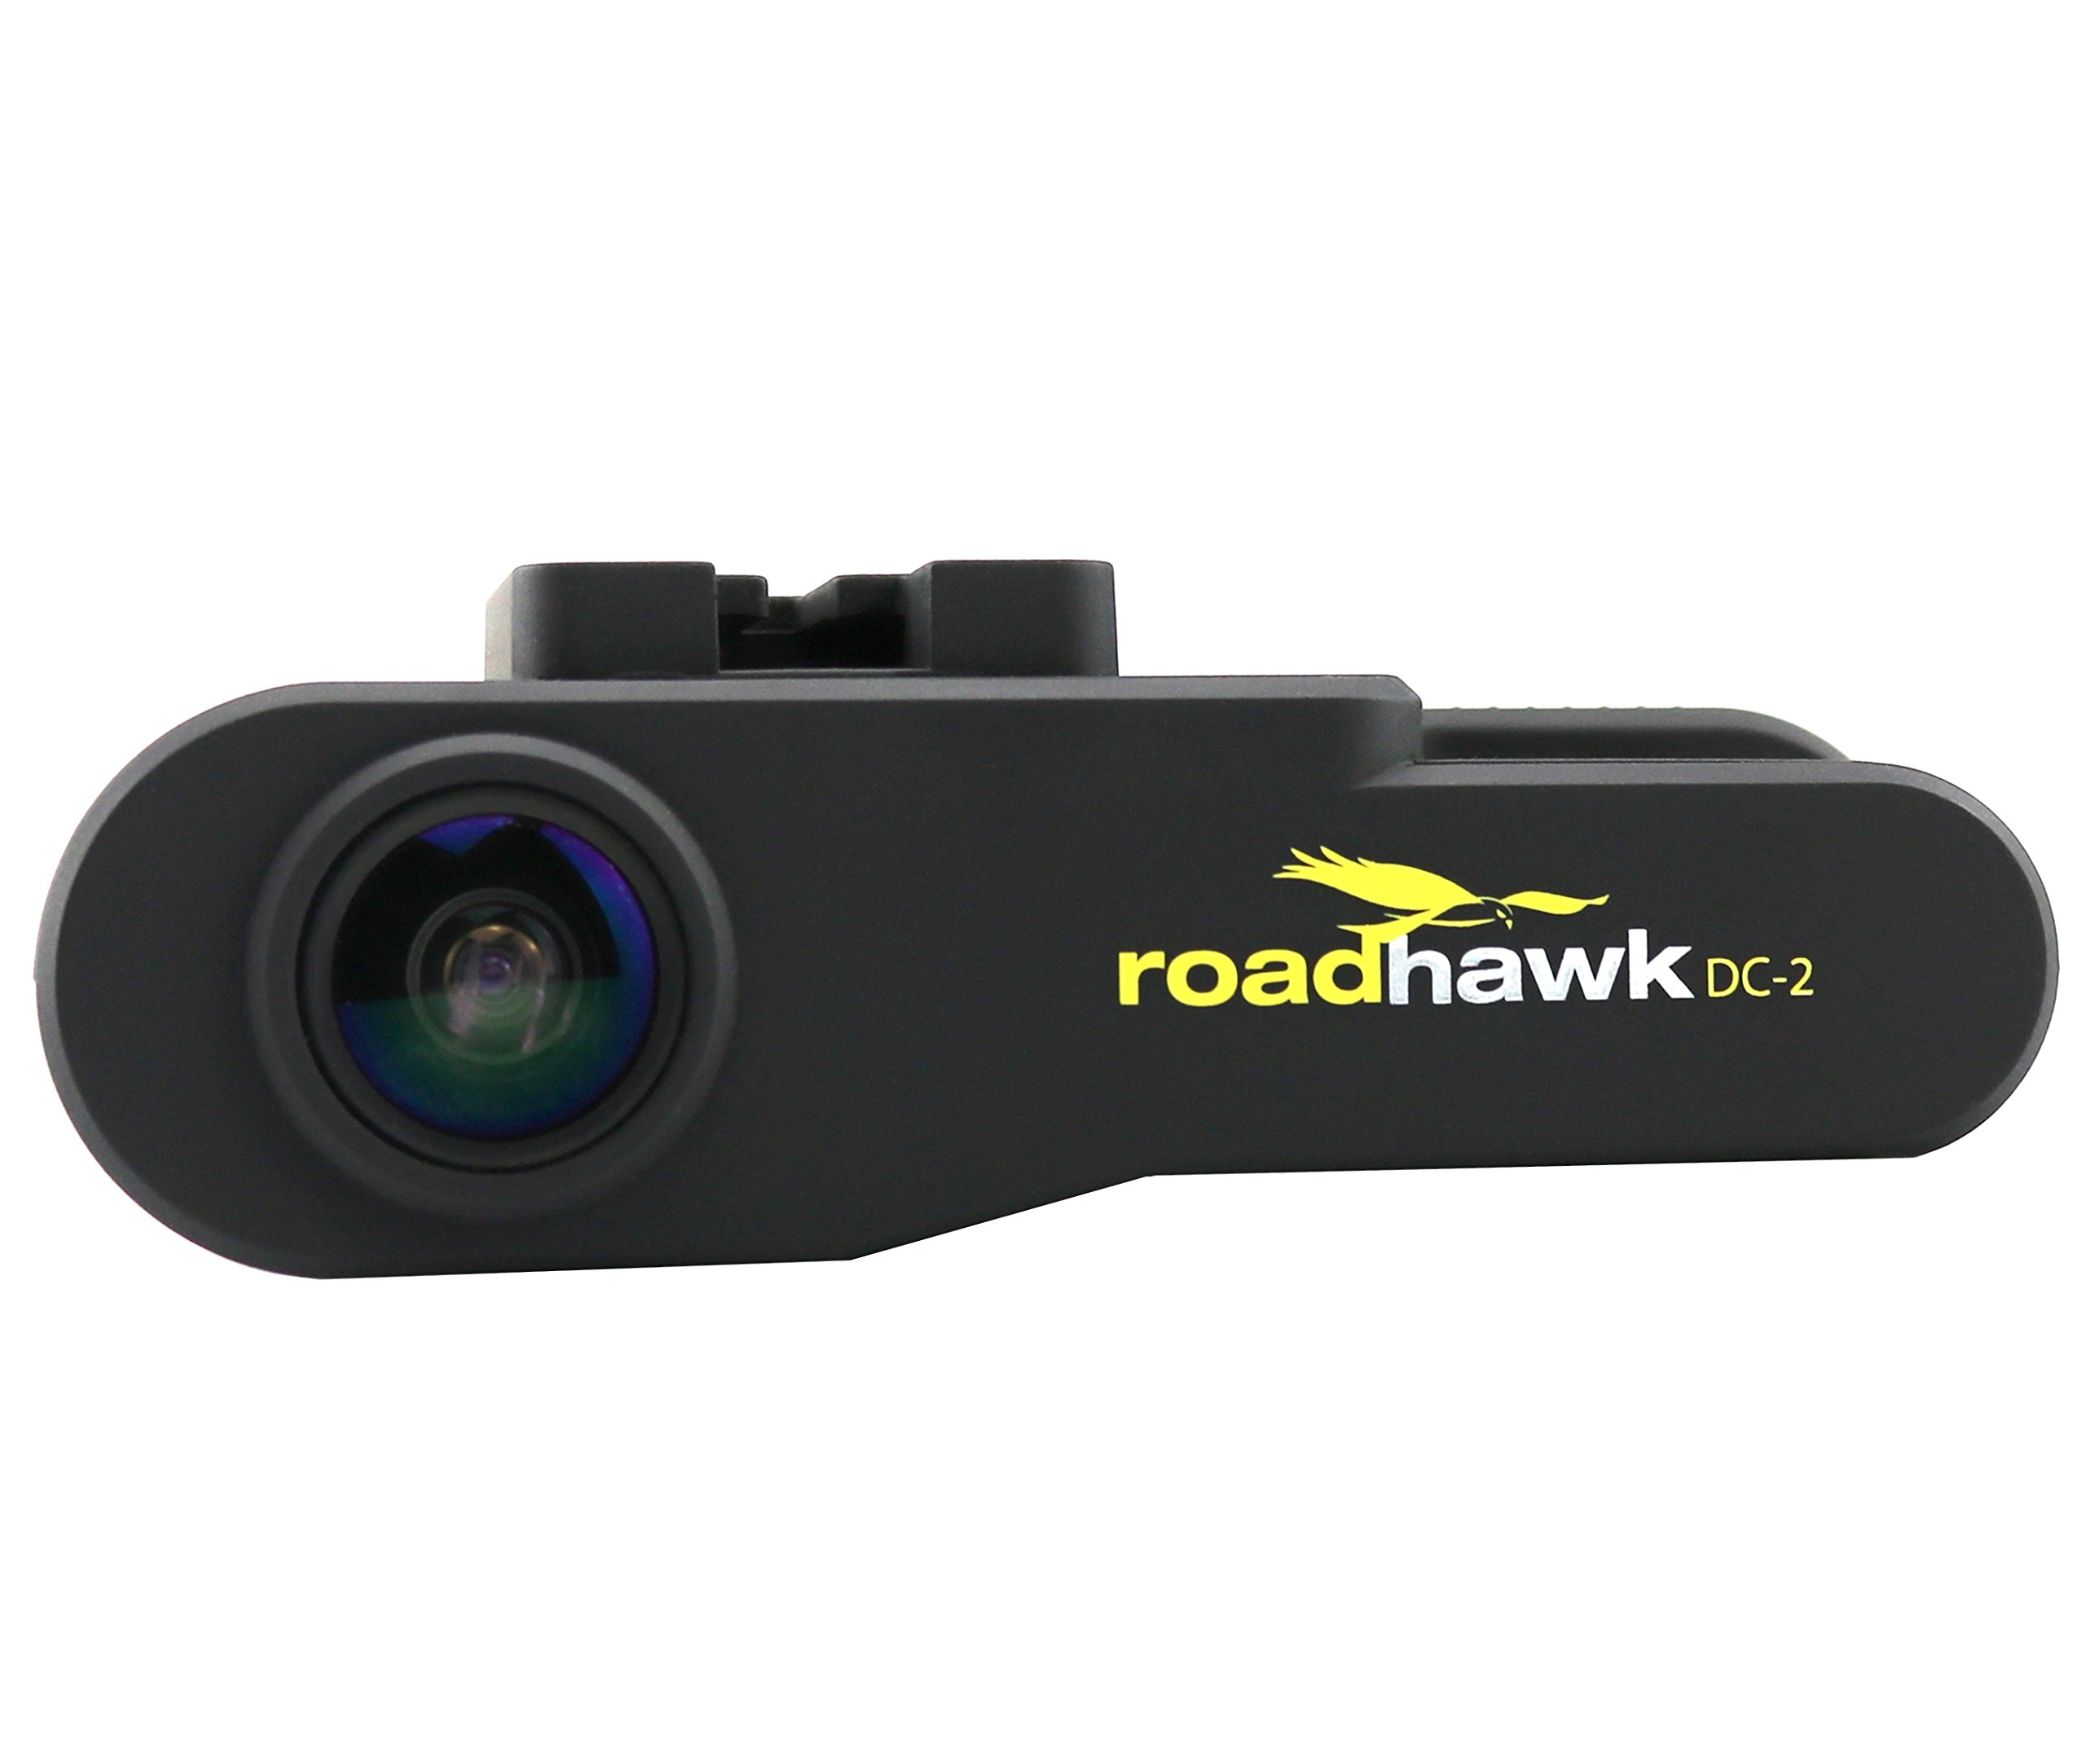 RoadHawk DC-2 Black Box Recorder with Forward Facing Camera